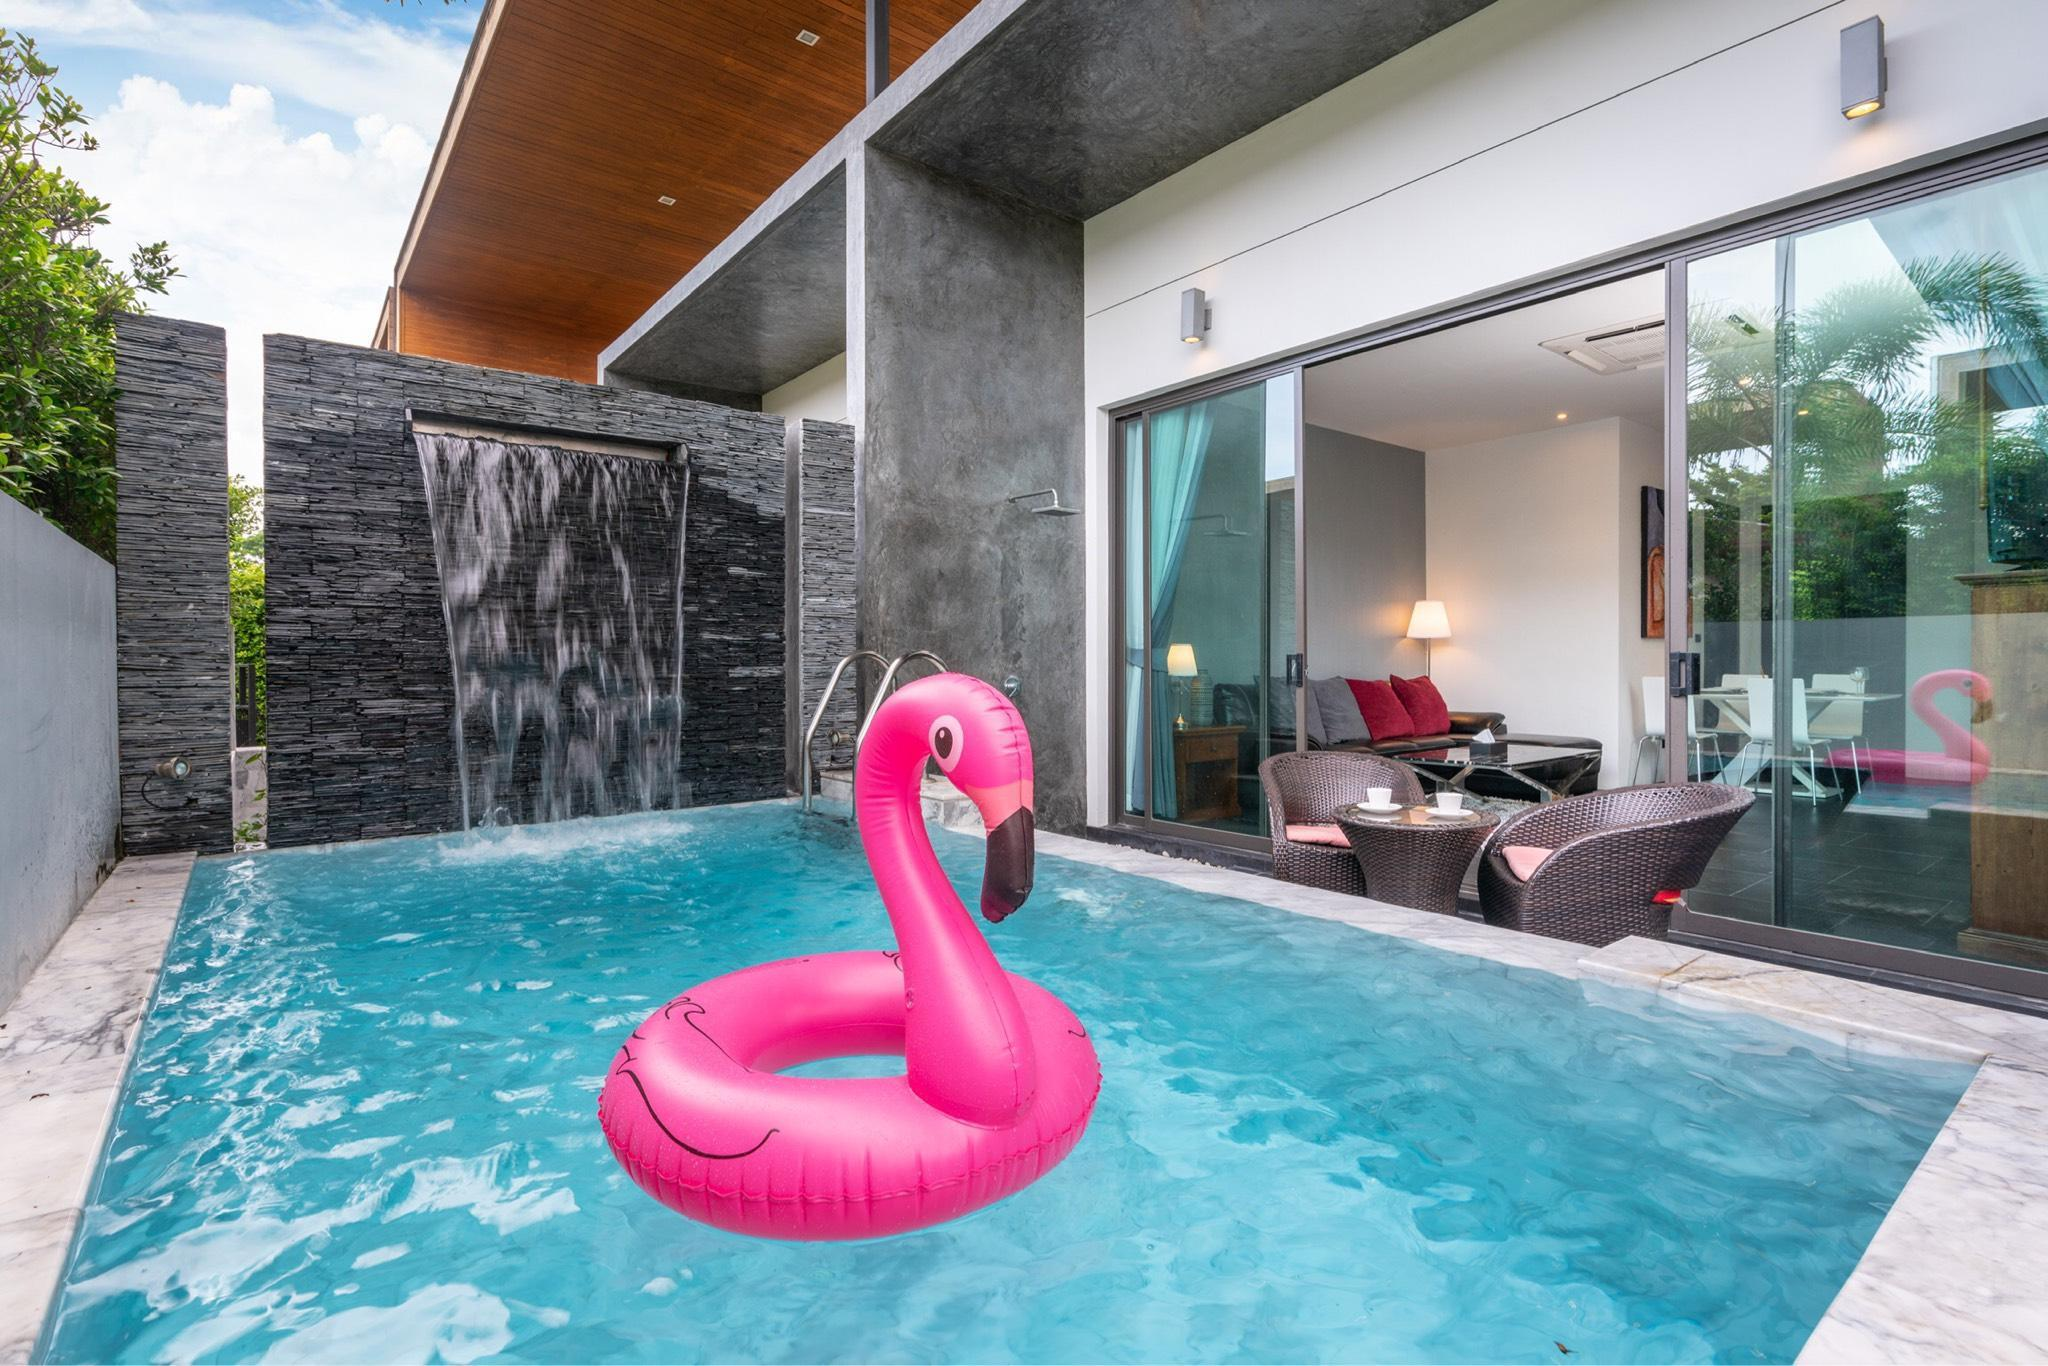 2Bedrooms Boutique Pool Villa at Chalong Phuket วิลลา 2 ห้องนอน 2 ห้องน้ำส่วนตัว ขนาด 140 ตร.ม. – ฉลอง